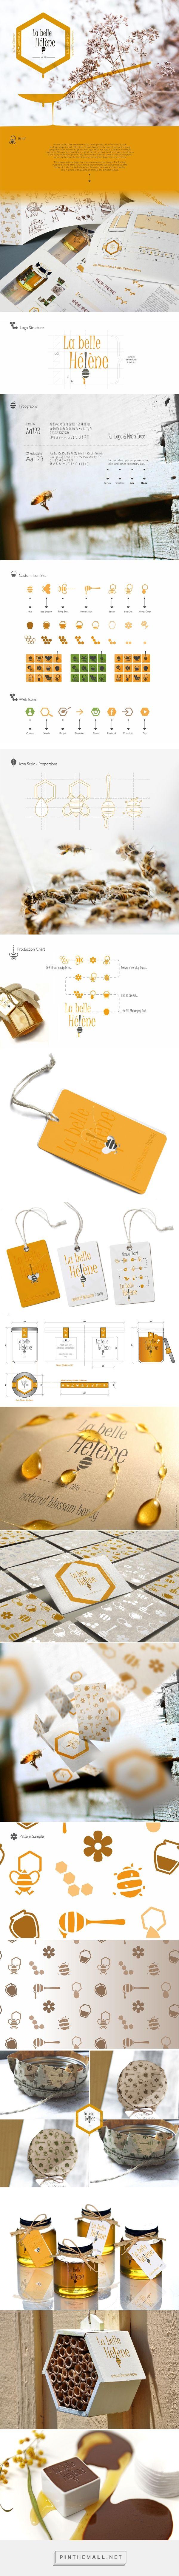 Honey | Logo & packaging on Behance - created via https://pinthemall.net